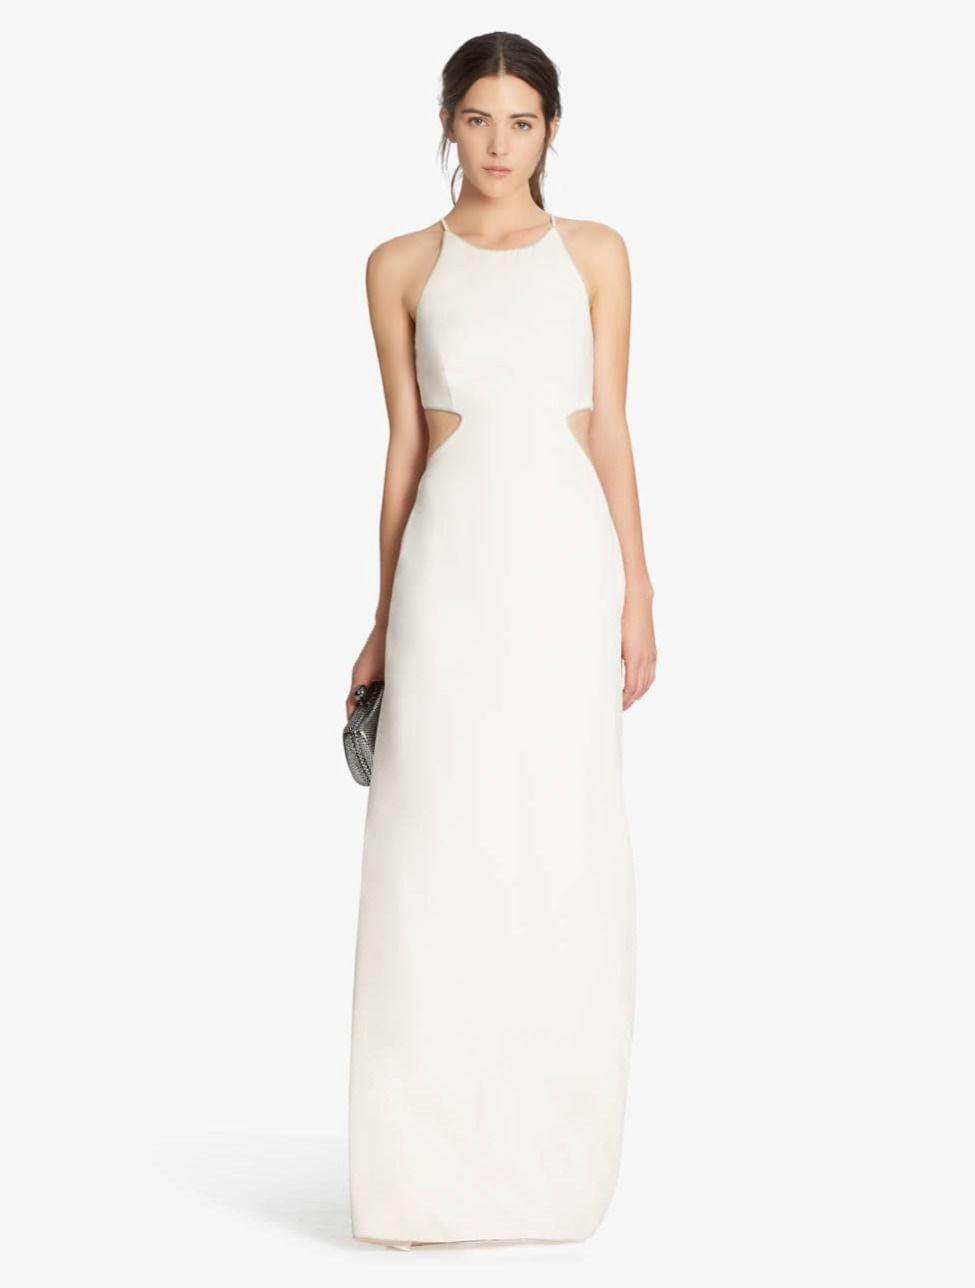 Pin by Cristina Ellis on dresses | Dresses, Rehearsal